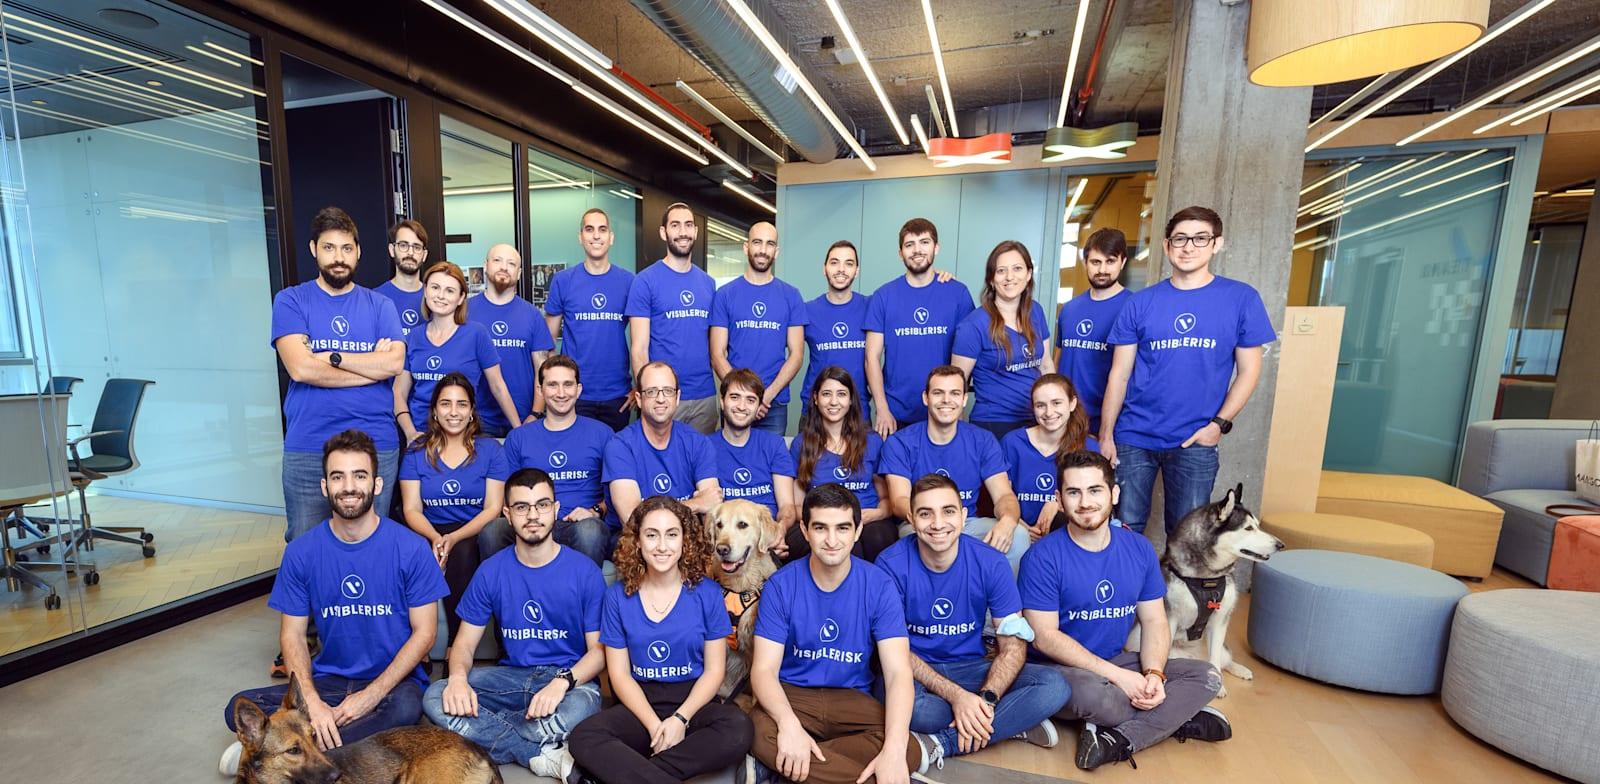 VisibleRisk employees Photo: Doron Letzter